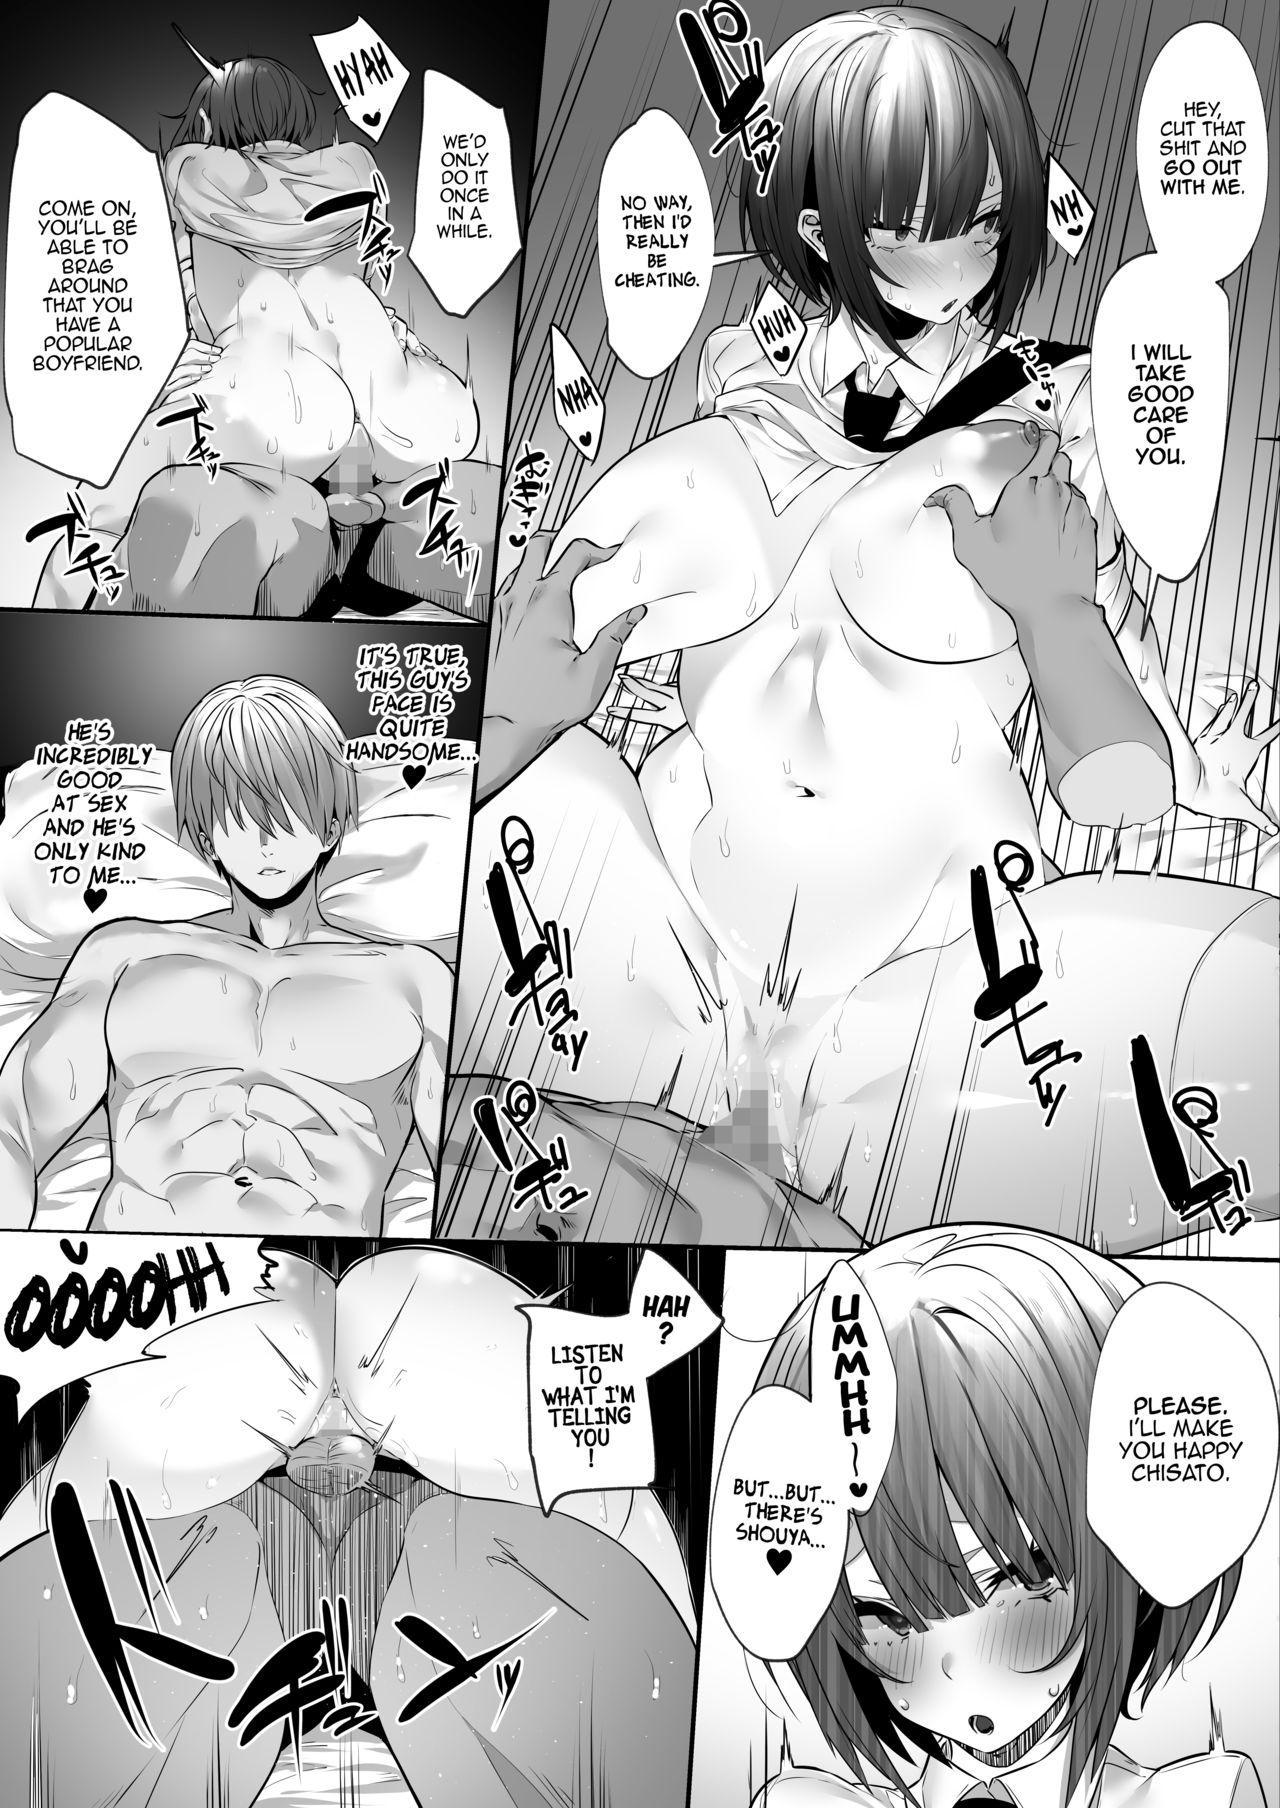 Tsuyoki na Undoubu Joshi ga Netorareru | Having Cheating Sex wih the Strong-minded Girl from the School's Athletic Club 29